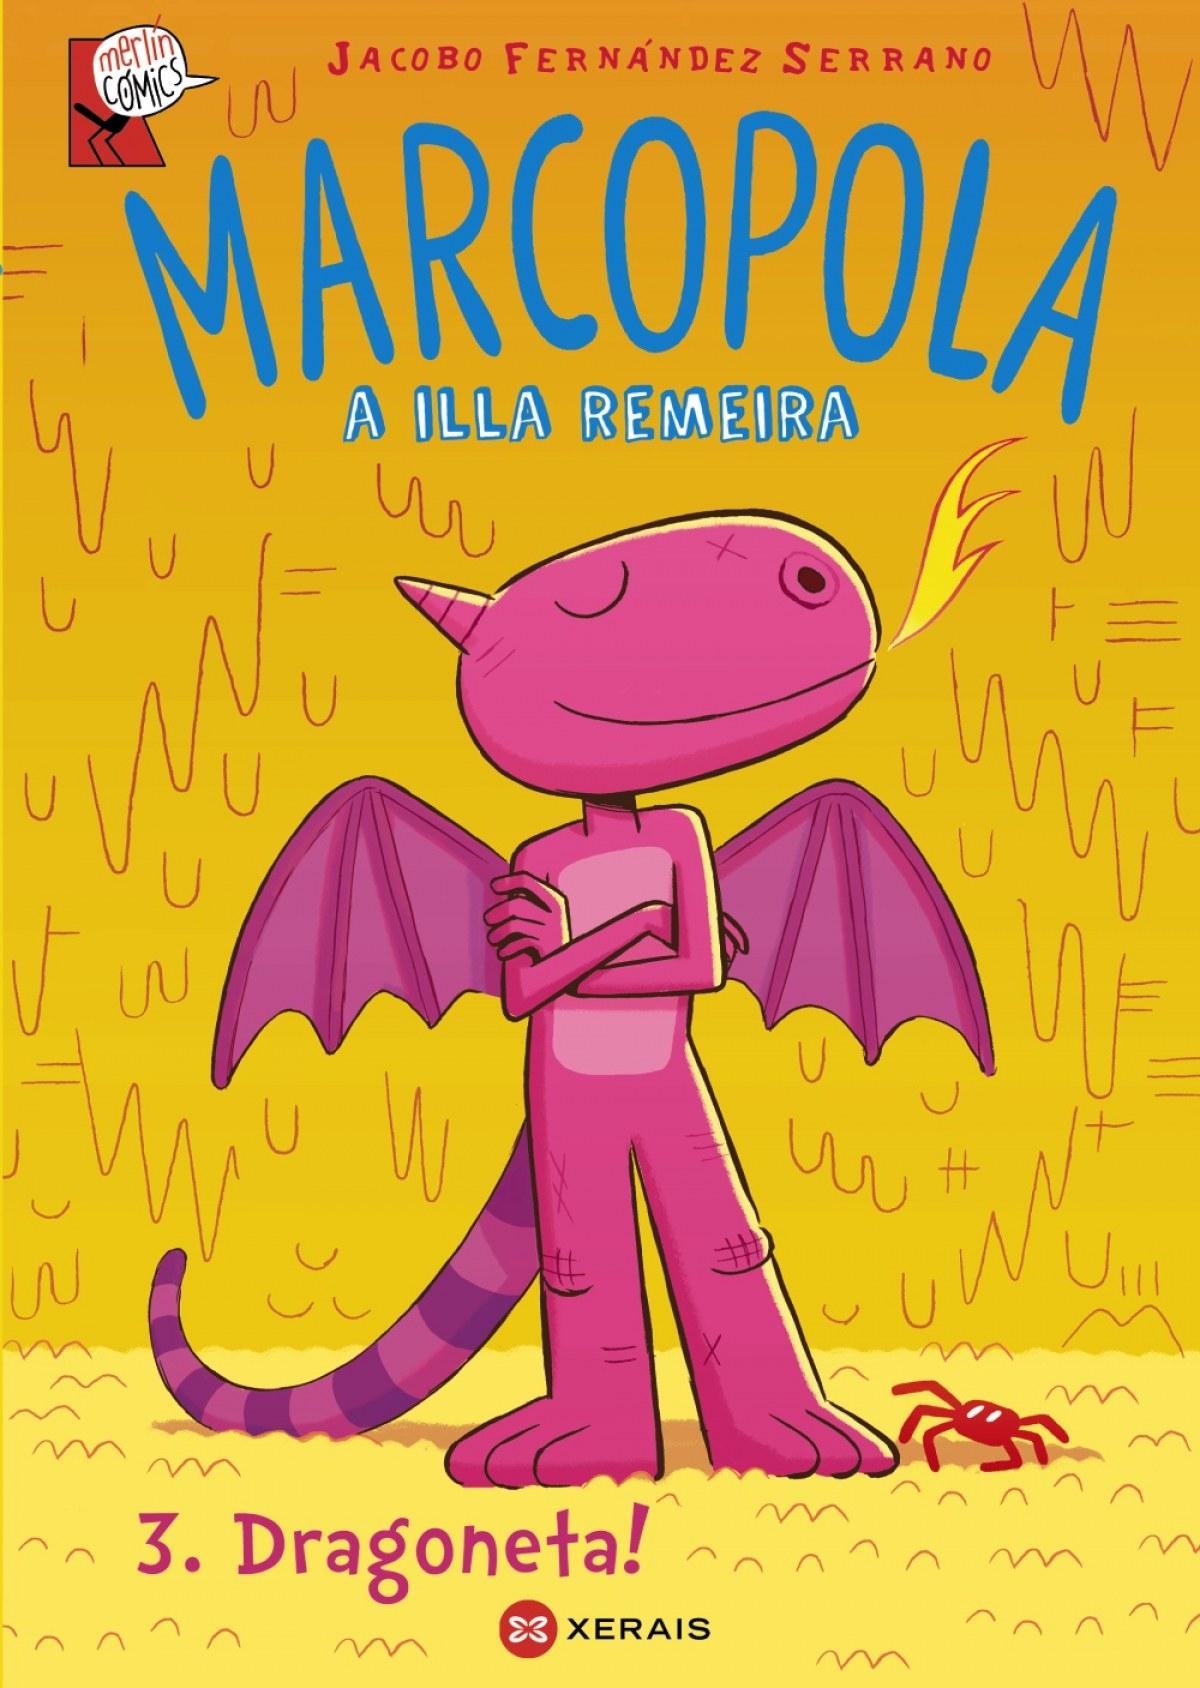 Marcopola 3 Dragoneta!